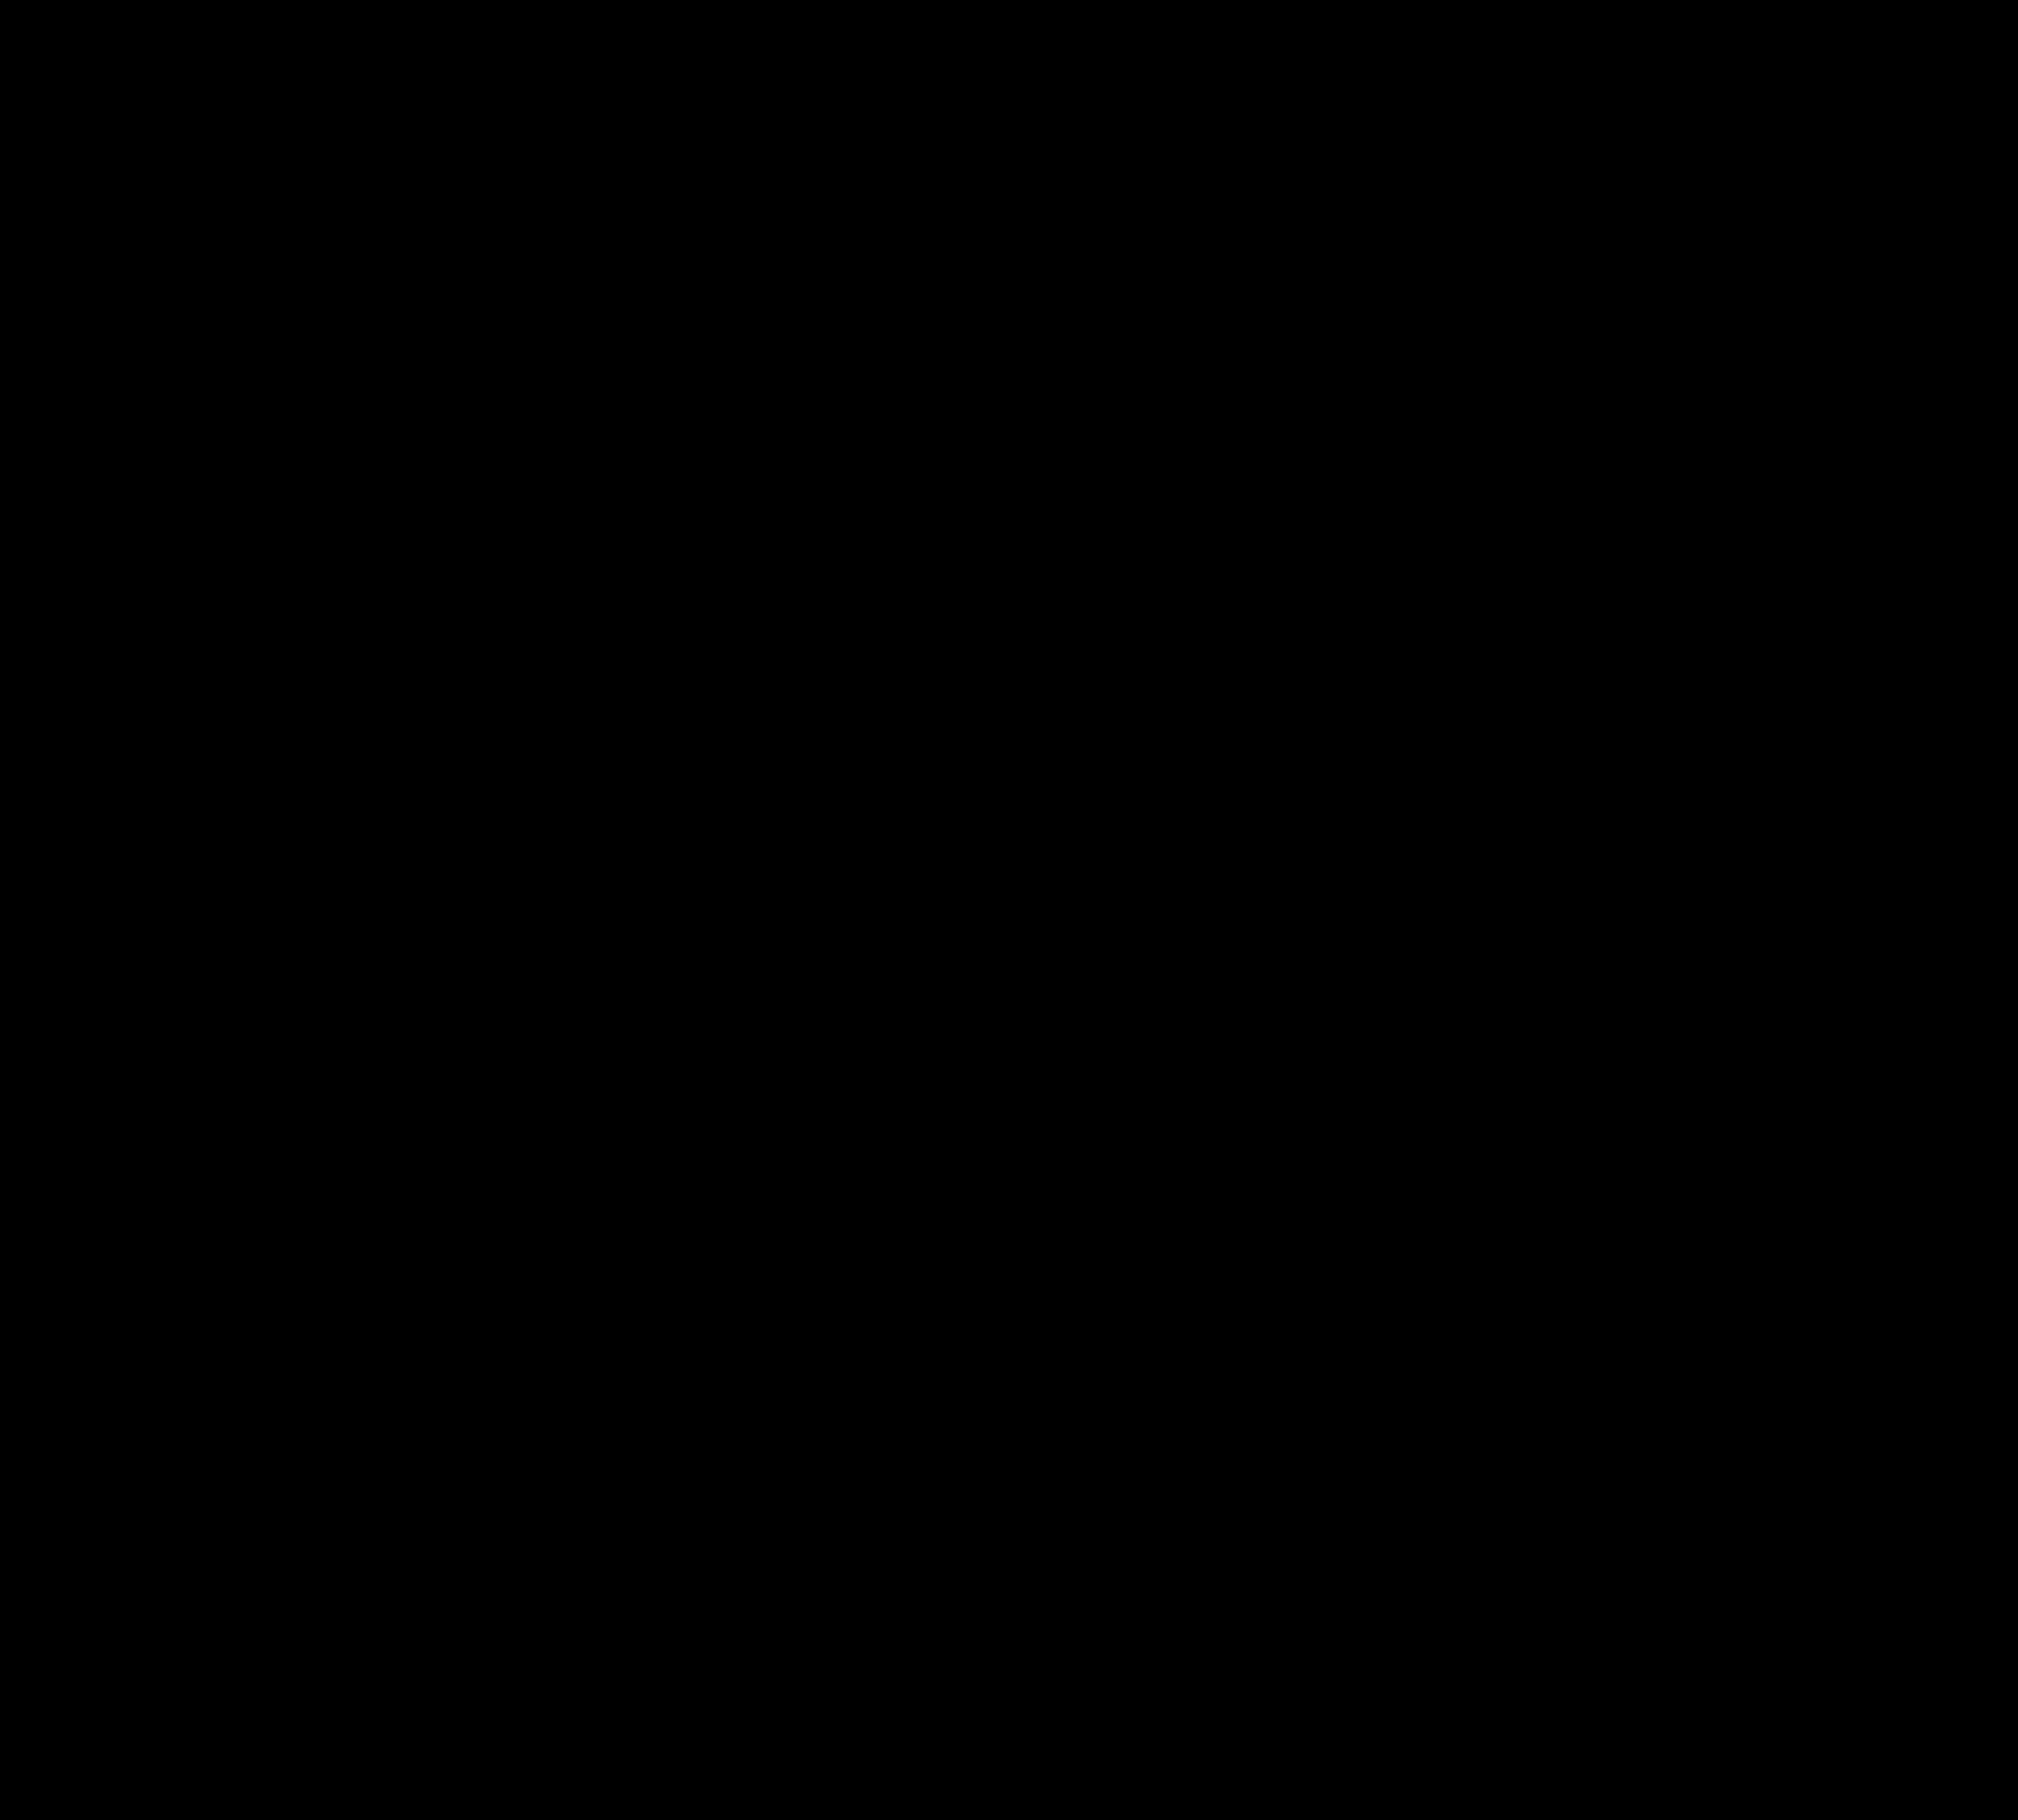 para marmitta XL beta rr 250-300 2020-2021